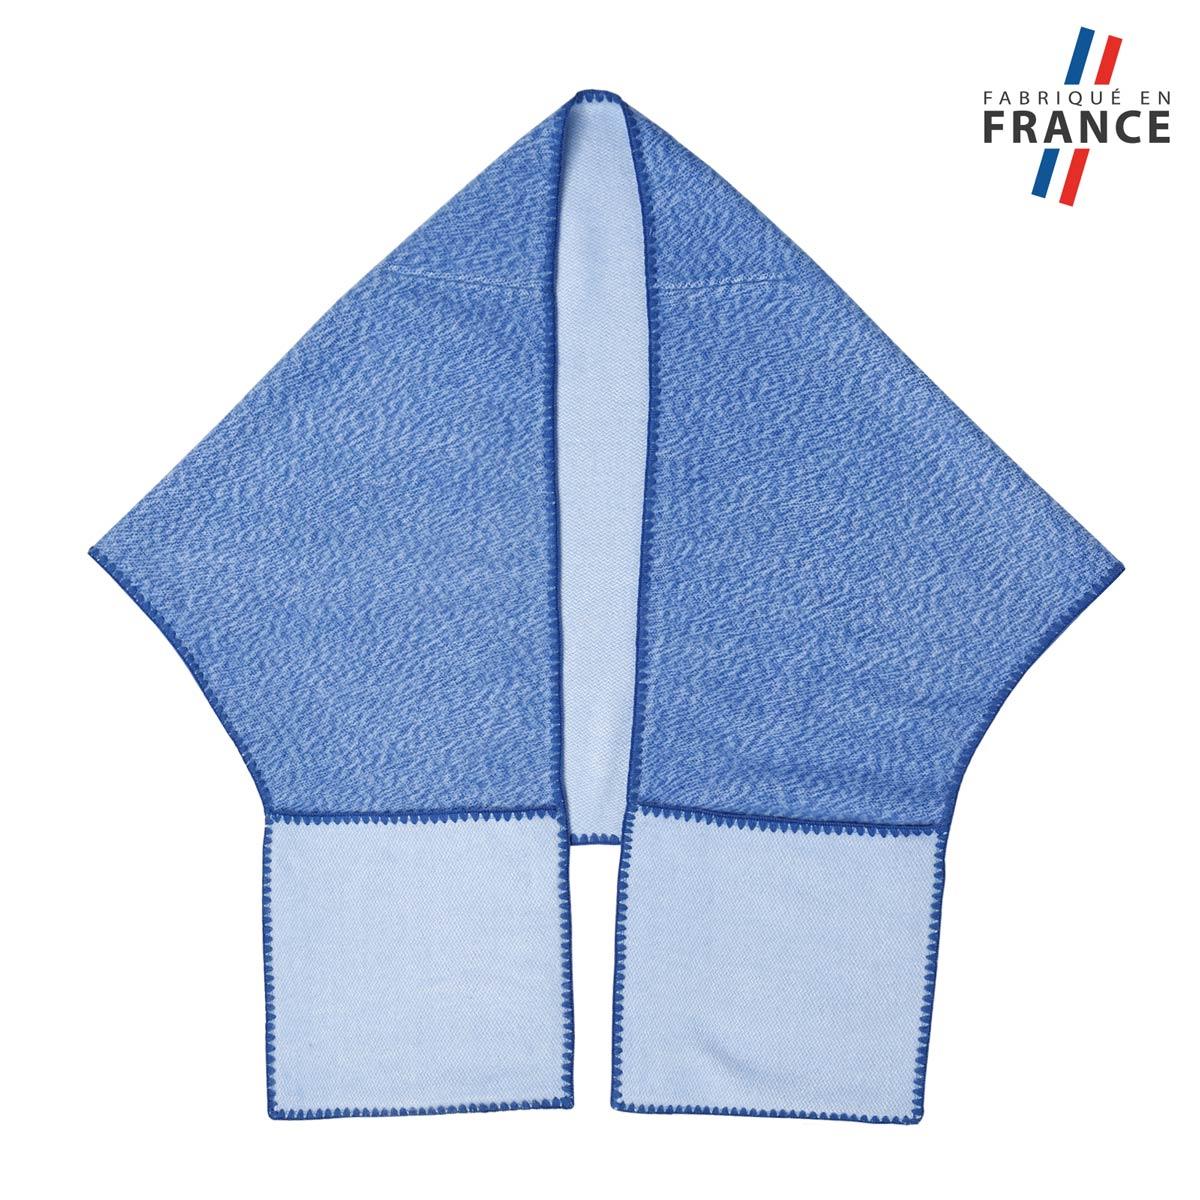 AT-04846-F12-LB_FR-chale-lima-bleu